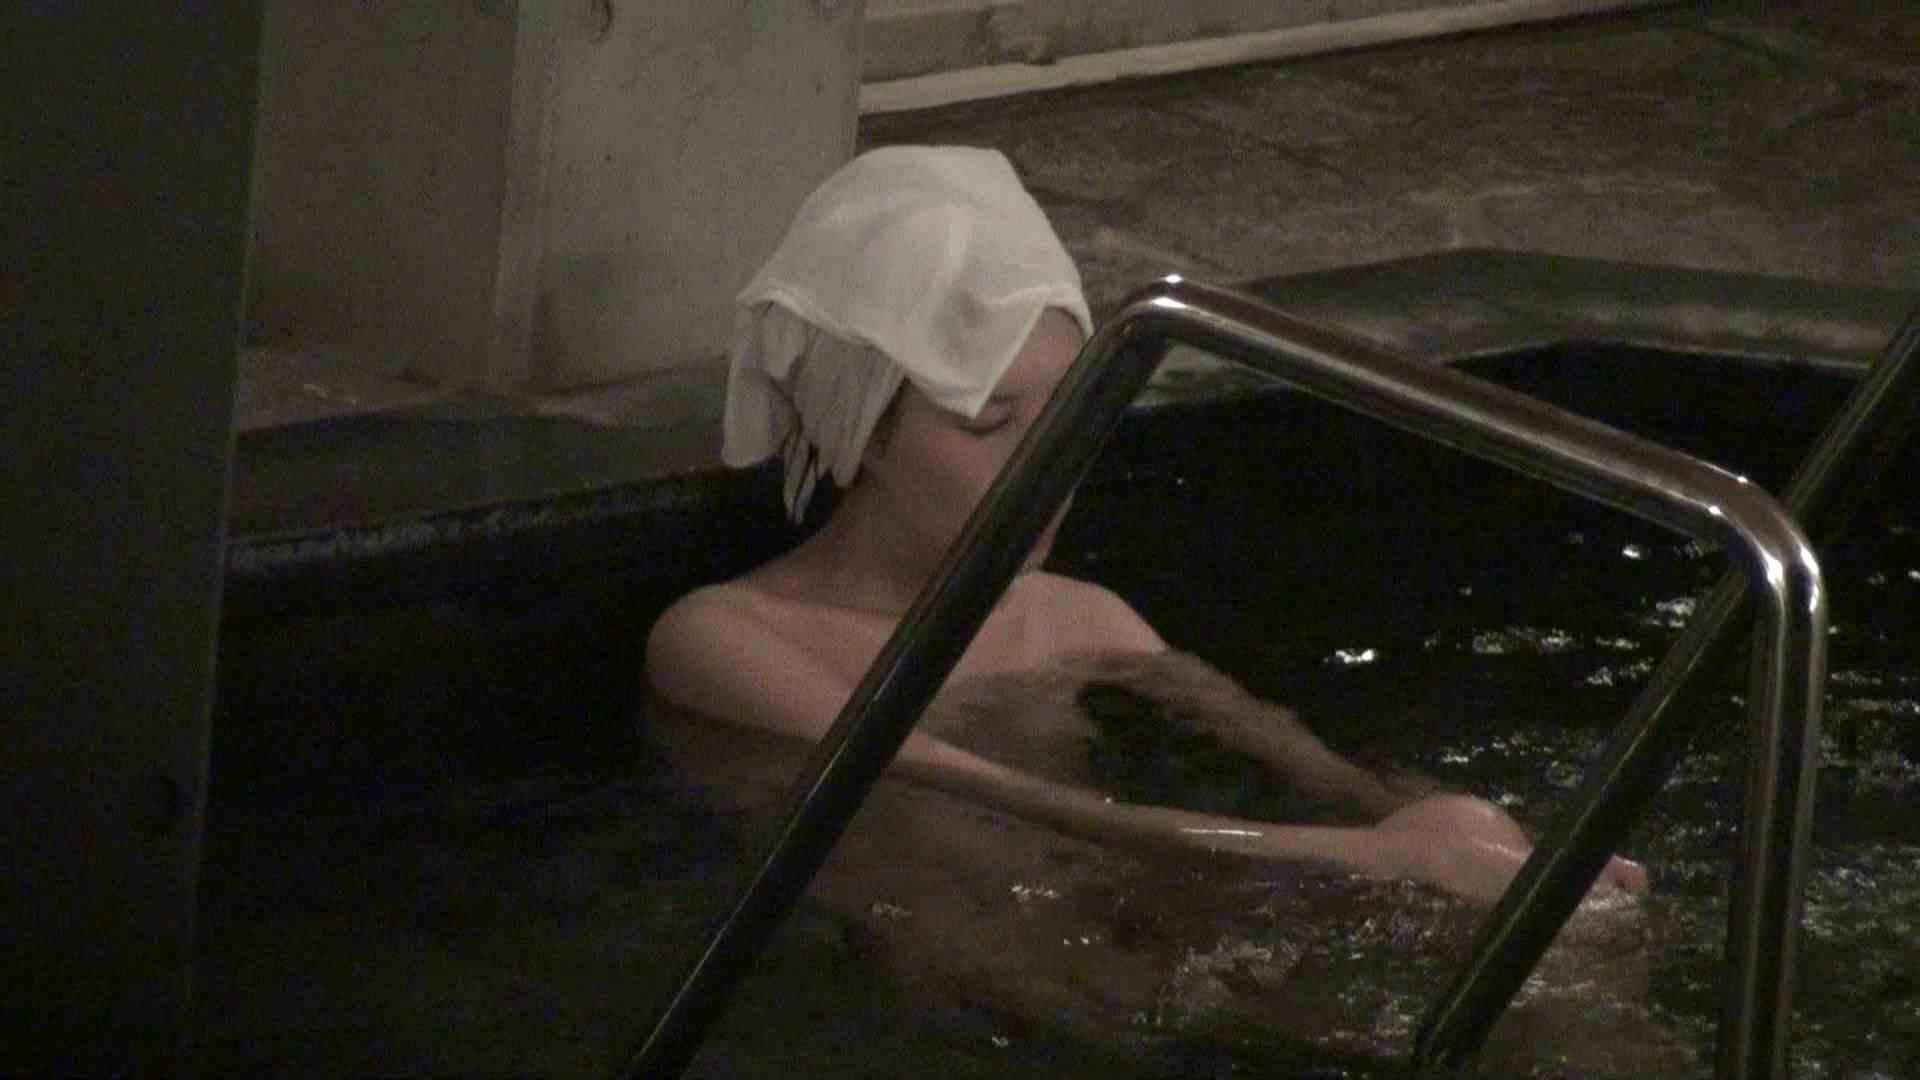 Aquaな露天風呂Vol.358 盗撮   OLセックス  92画像 46